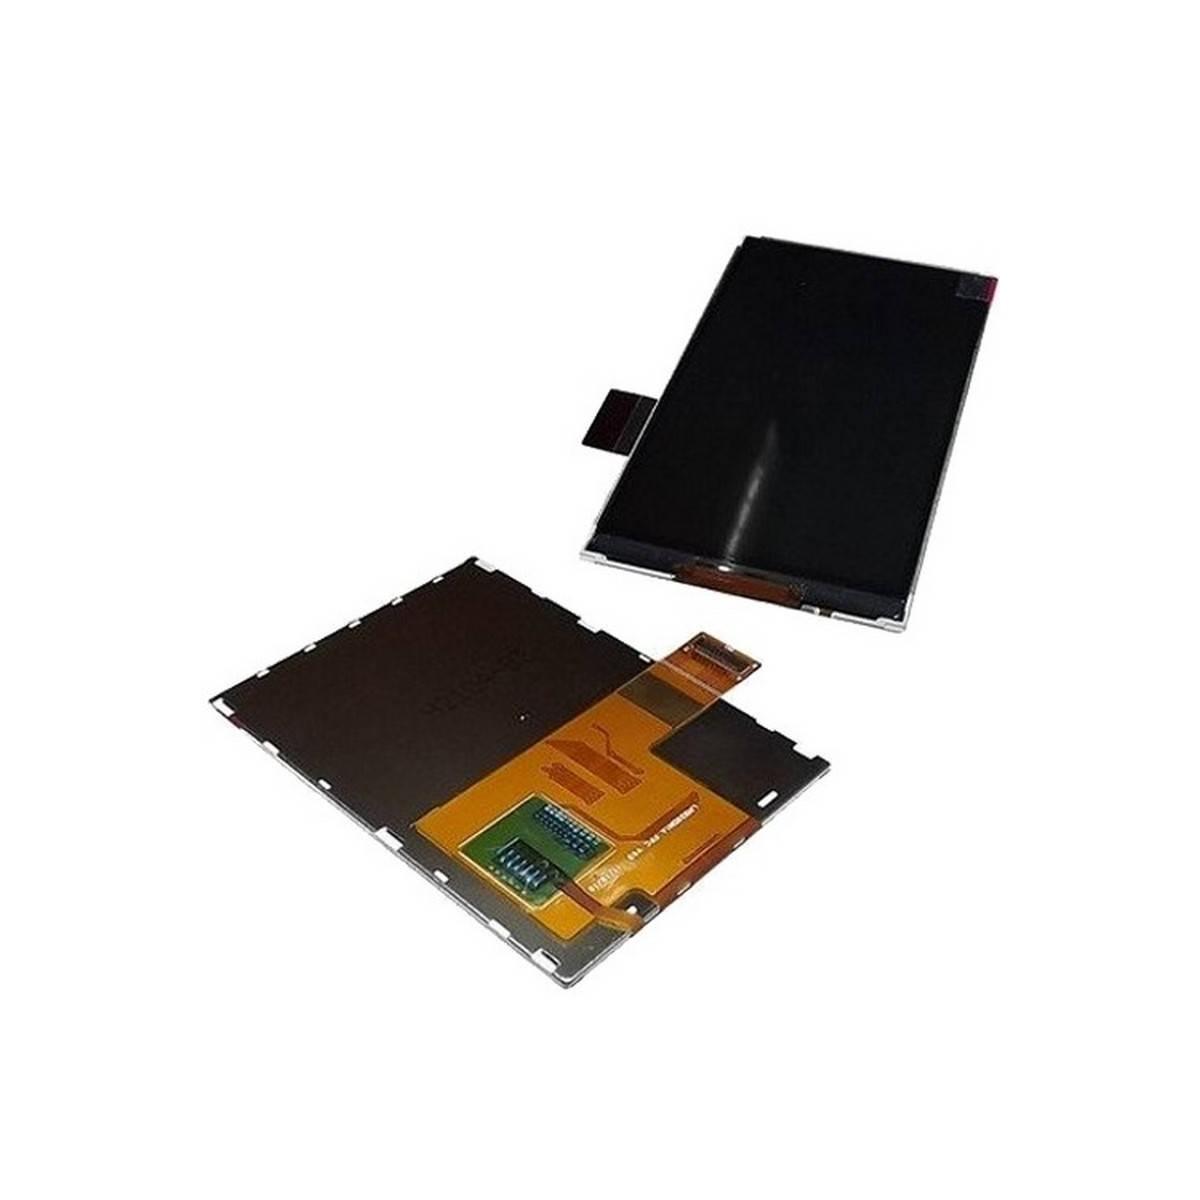 Ecrã LCD para LG E400 Optimus L3